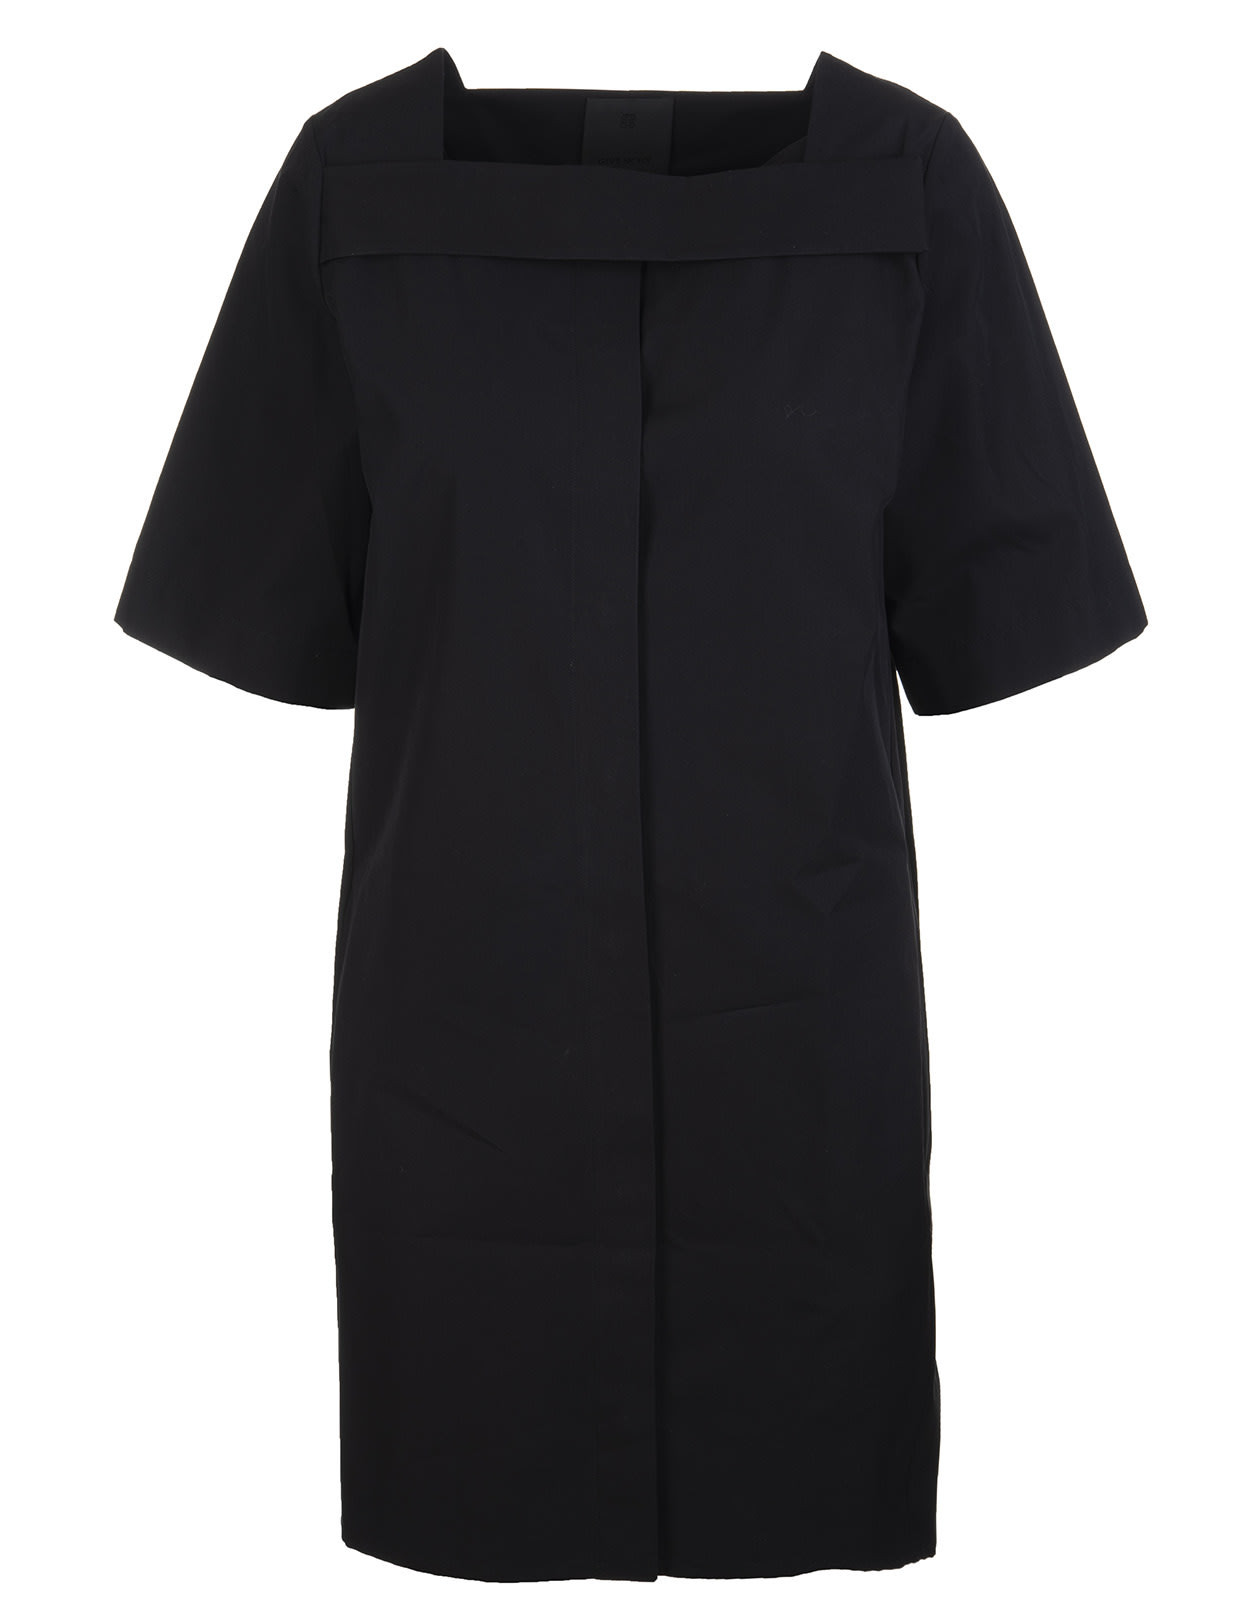 Givenchy Square Neck Short Dress